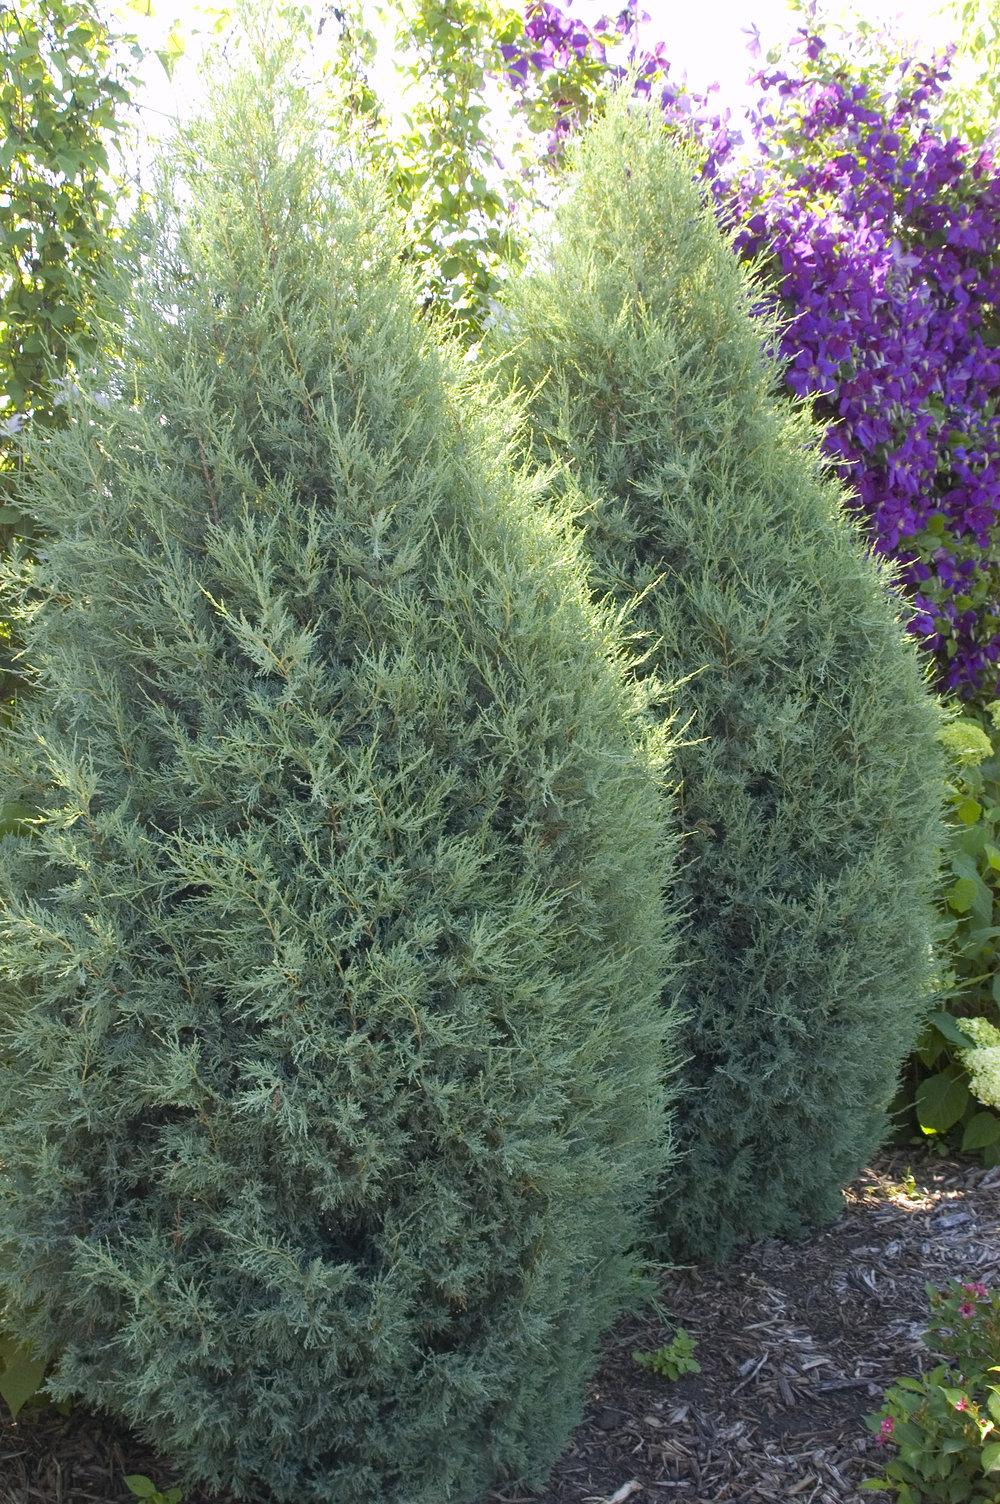 juniperusscopmedora1-1063.jpg